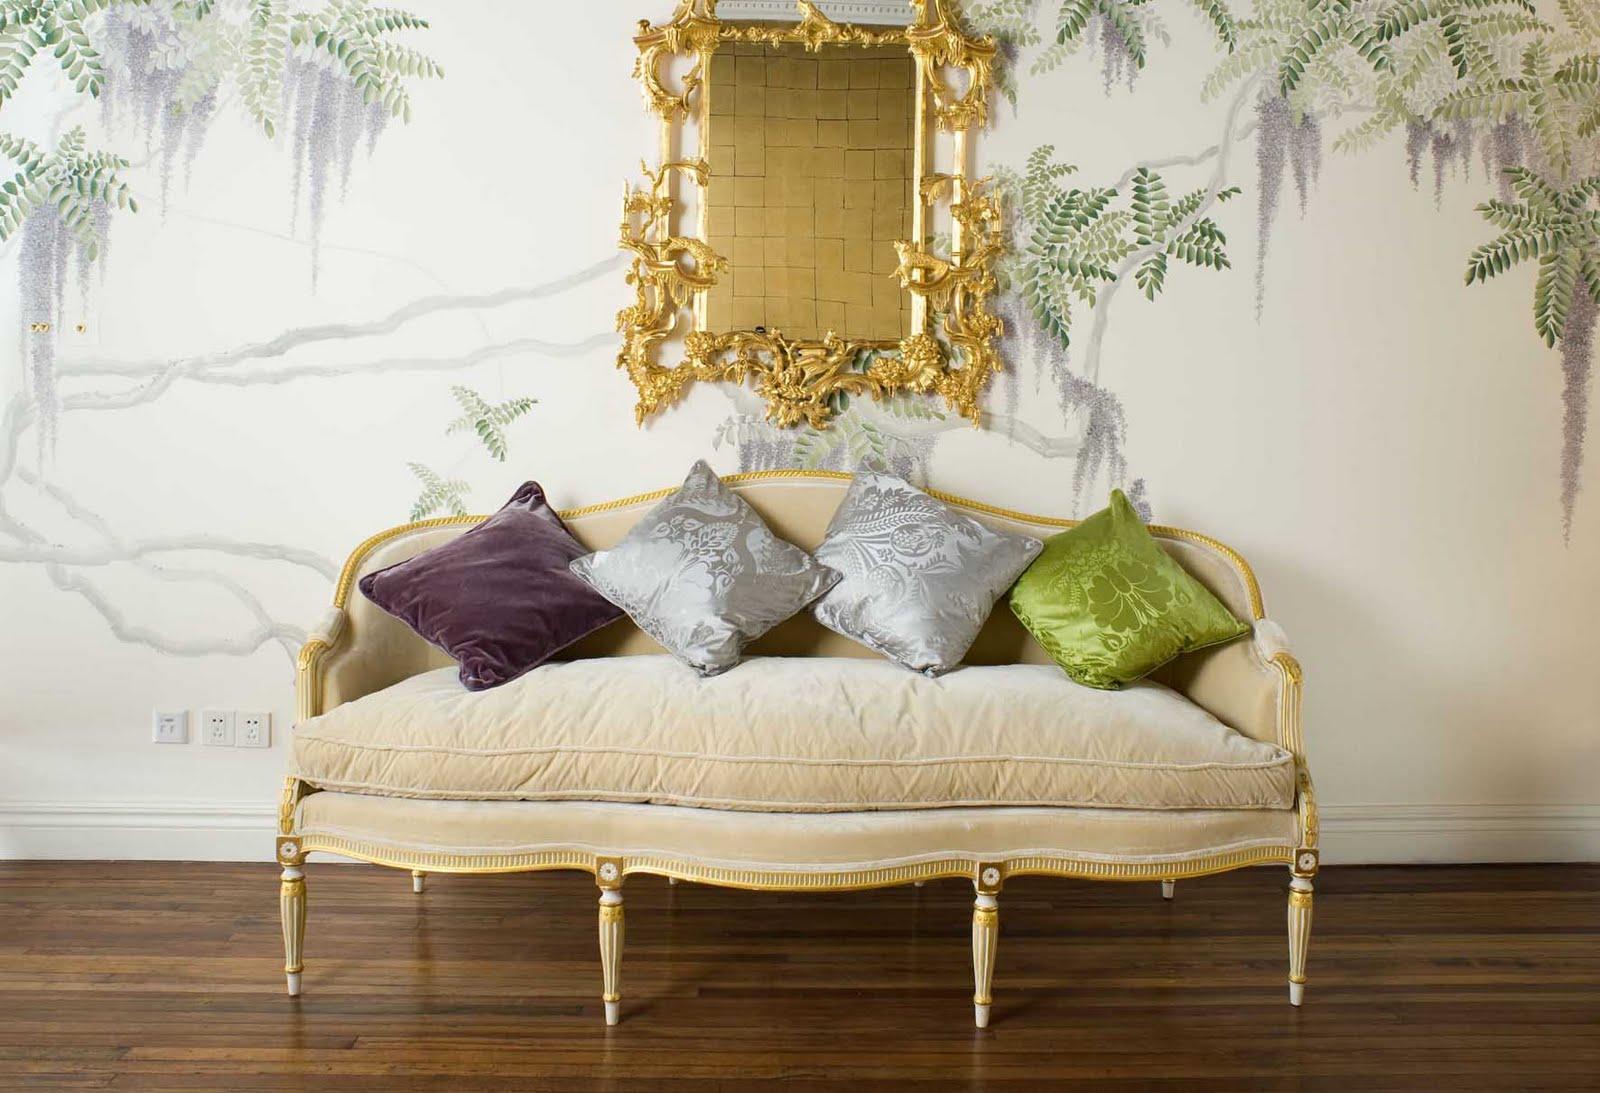 pretty french settee pillows gold mirror eclectic home decor ideas de gournay1